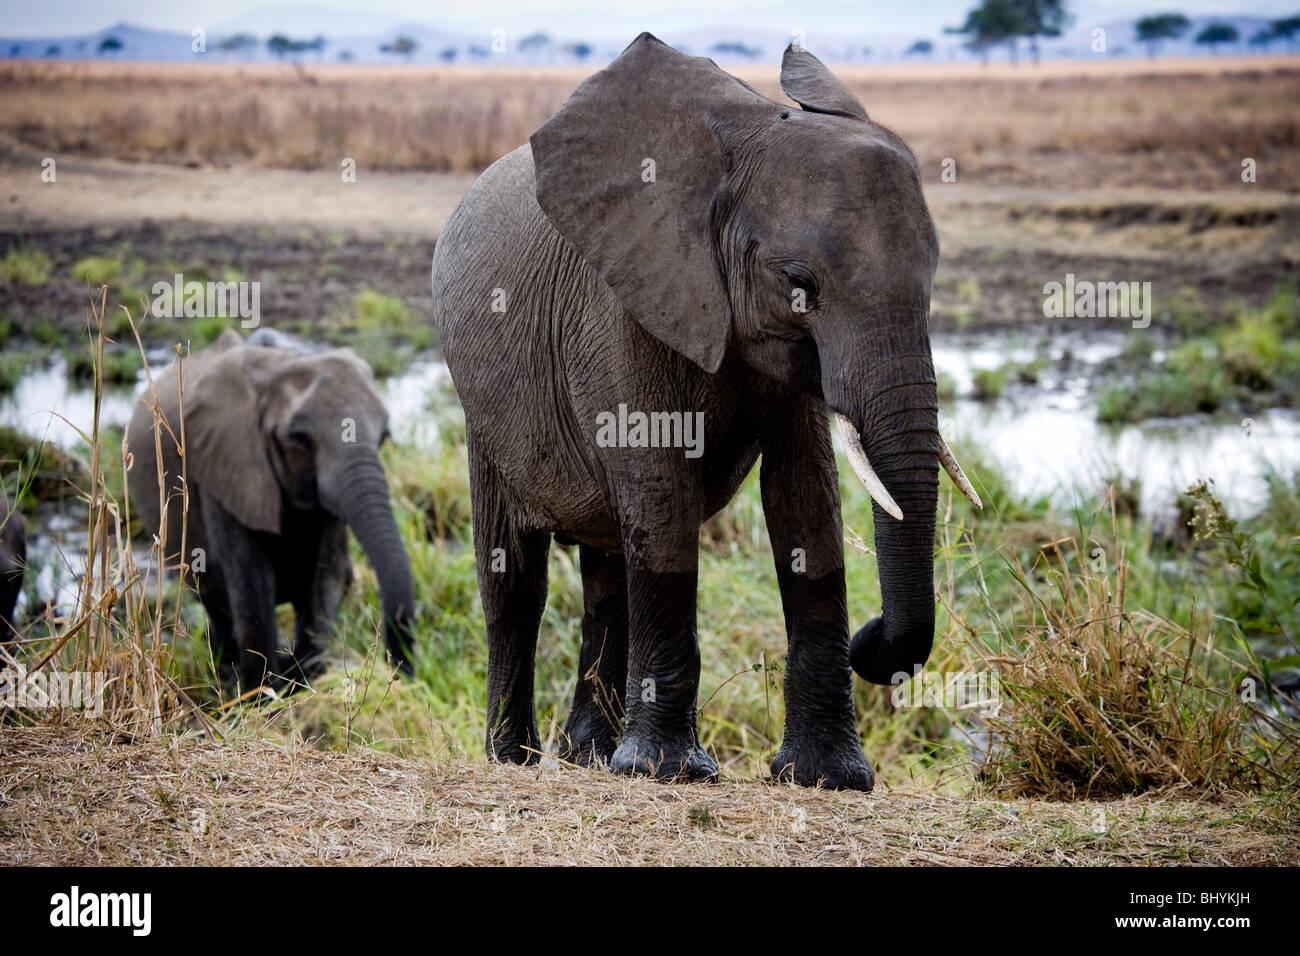 Family of elephants, Mikumi NP, Tanzania, East Africa - Stock Image